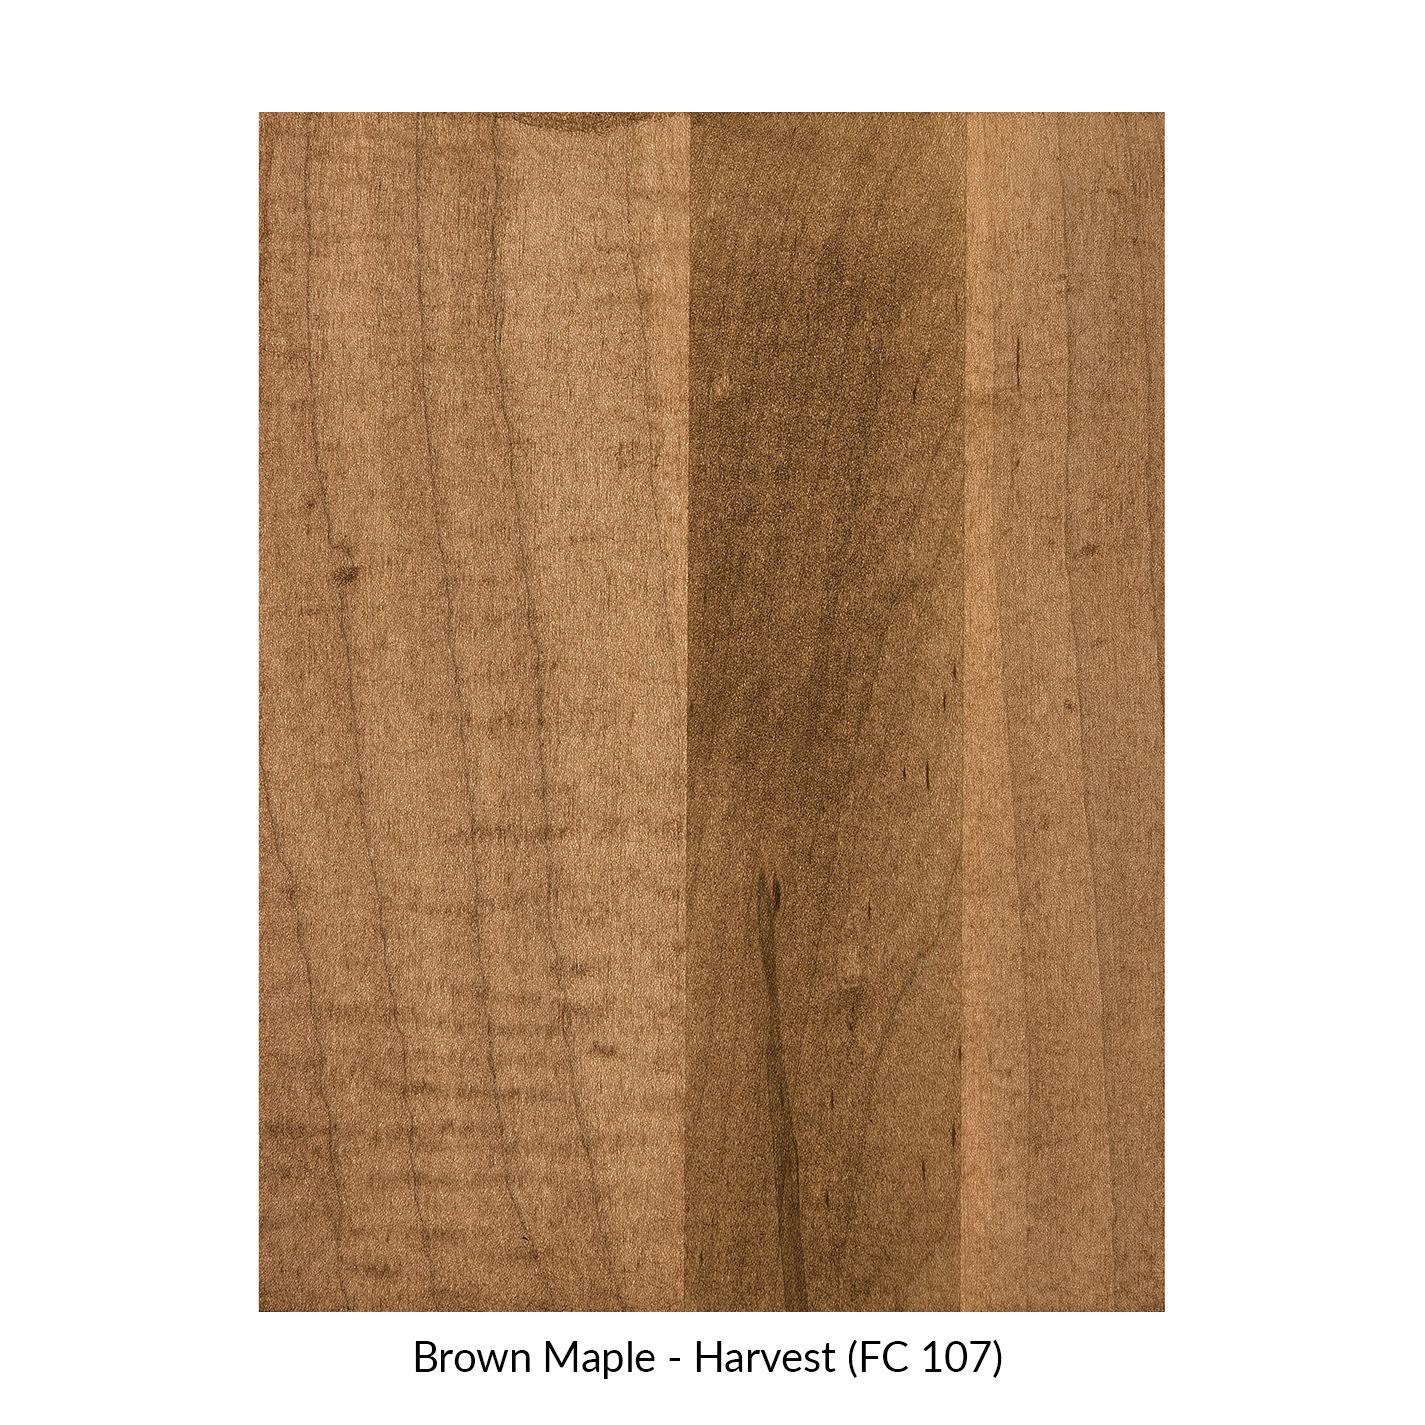 spectrum-brown-maple-harvest-fc-107.jpg